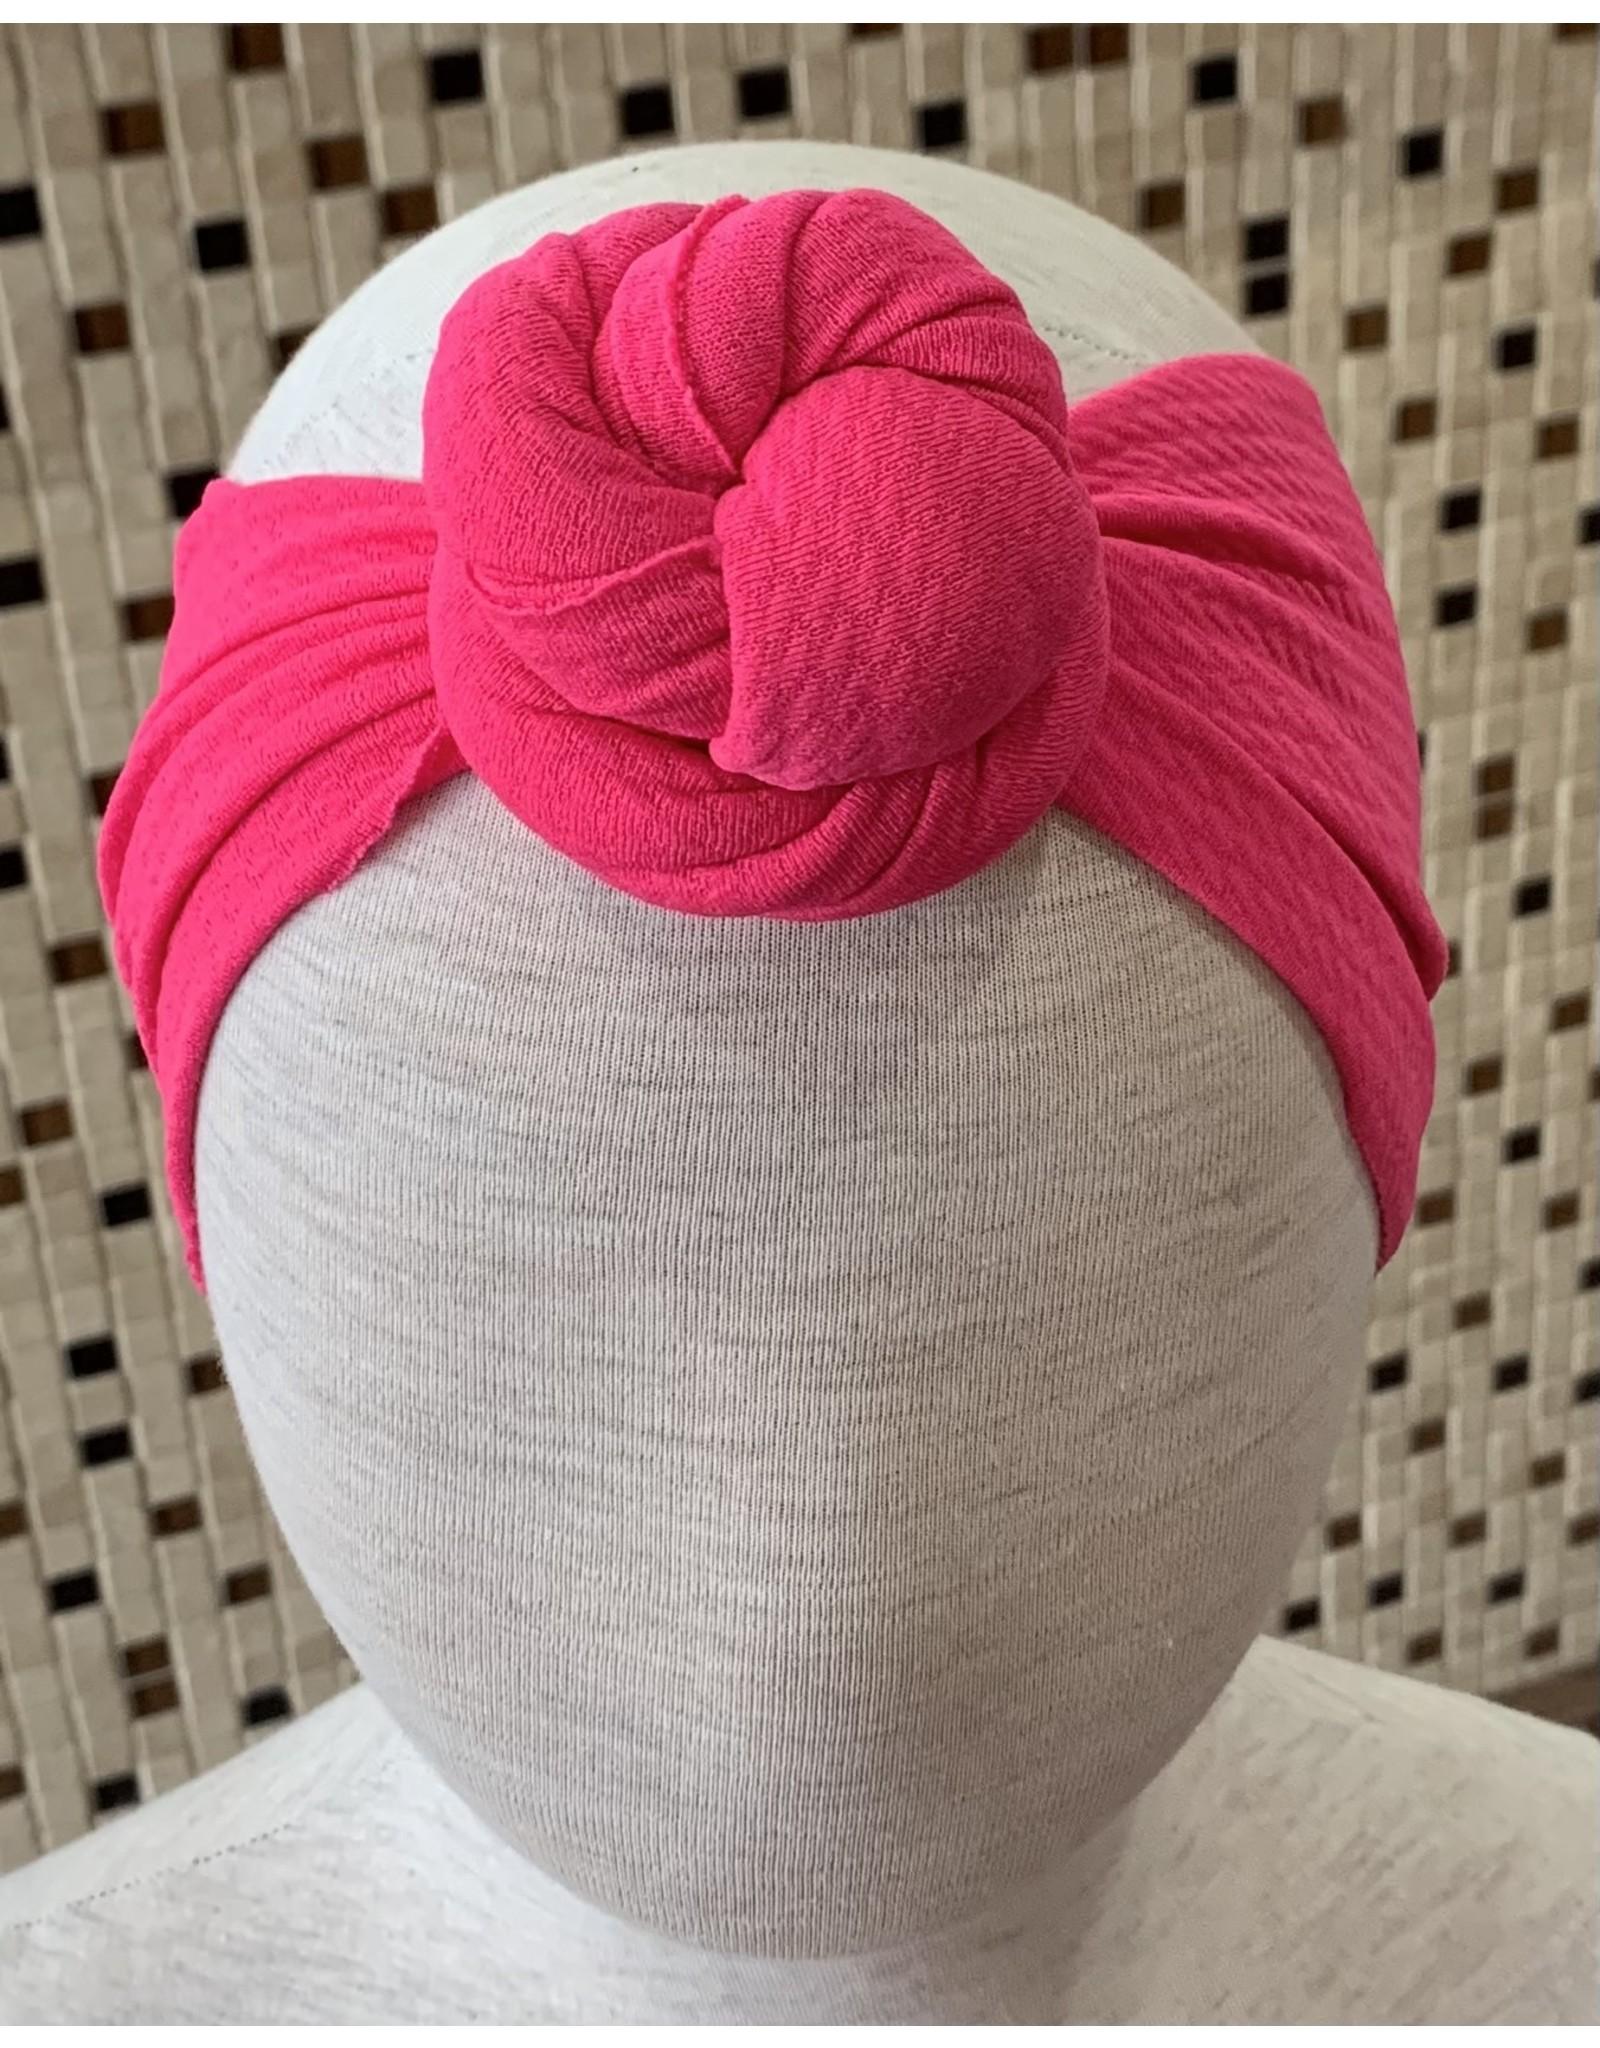 Bella Reese- Hot Pink Top Knot Headband